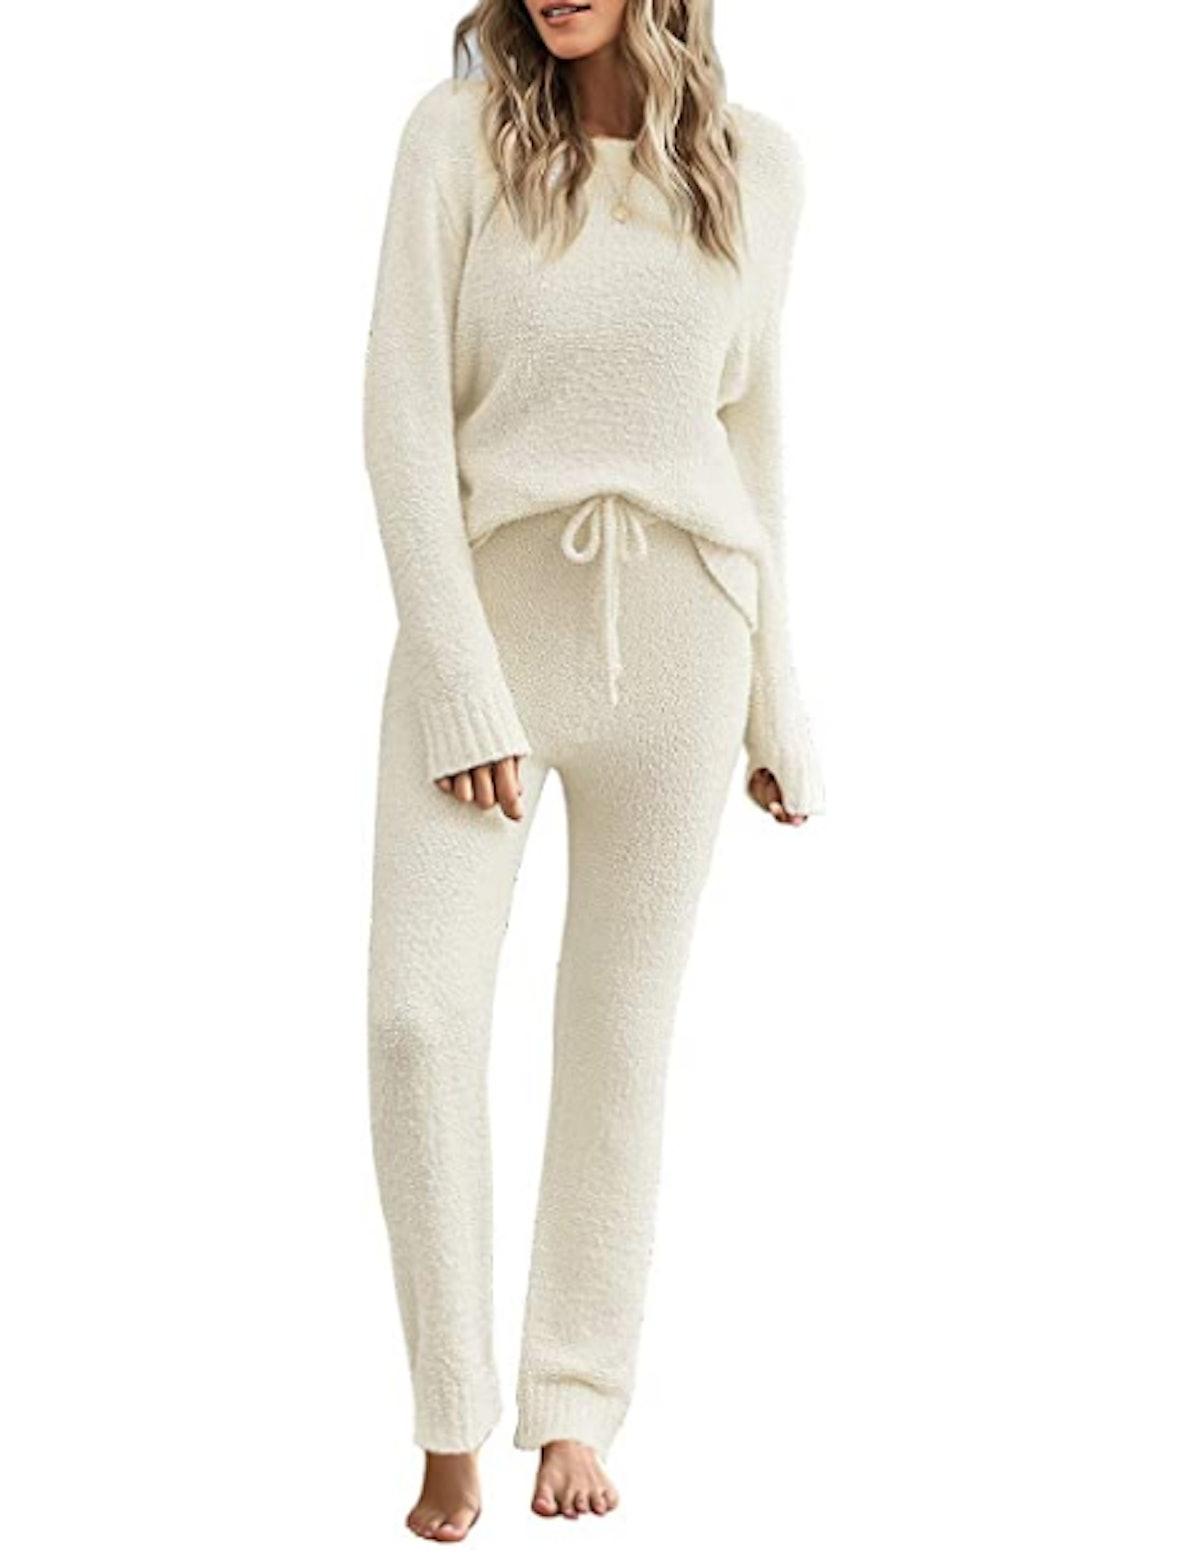 Luvamia Loungewear Set